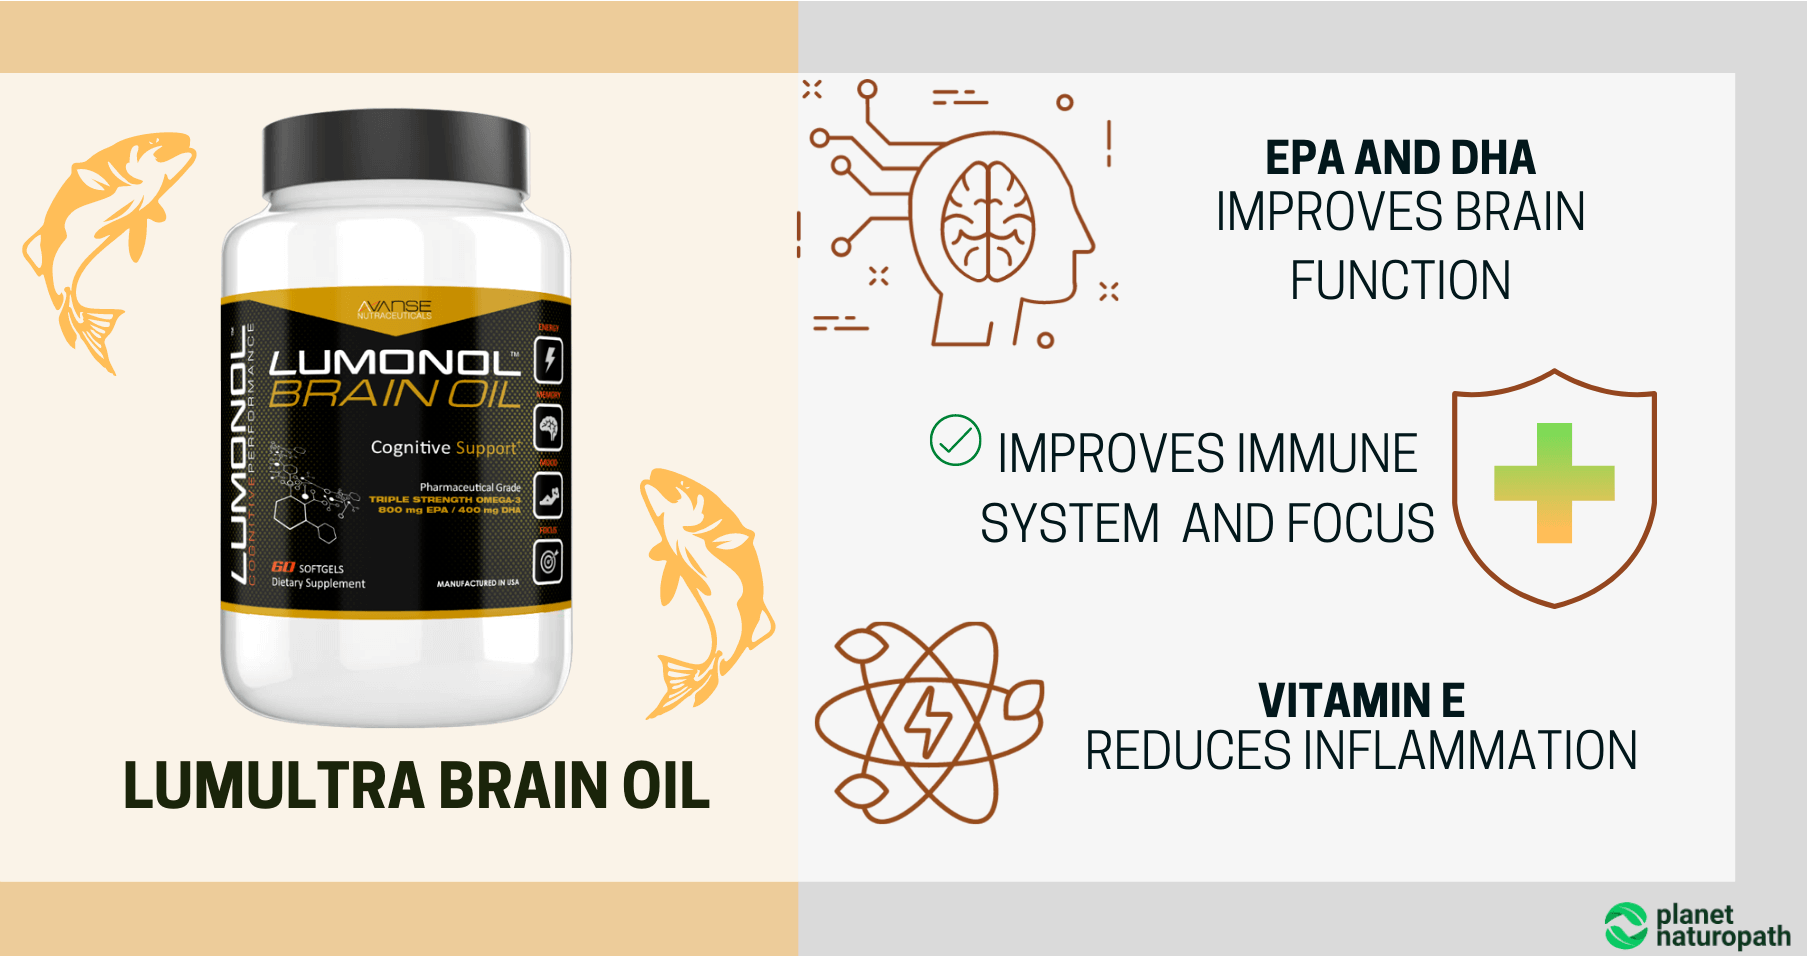 LumUltra-Brain-Oil